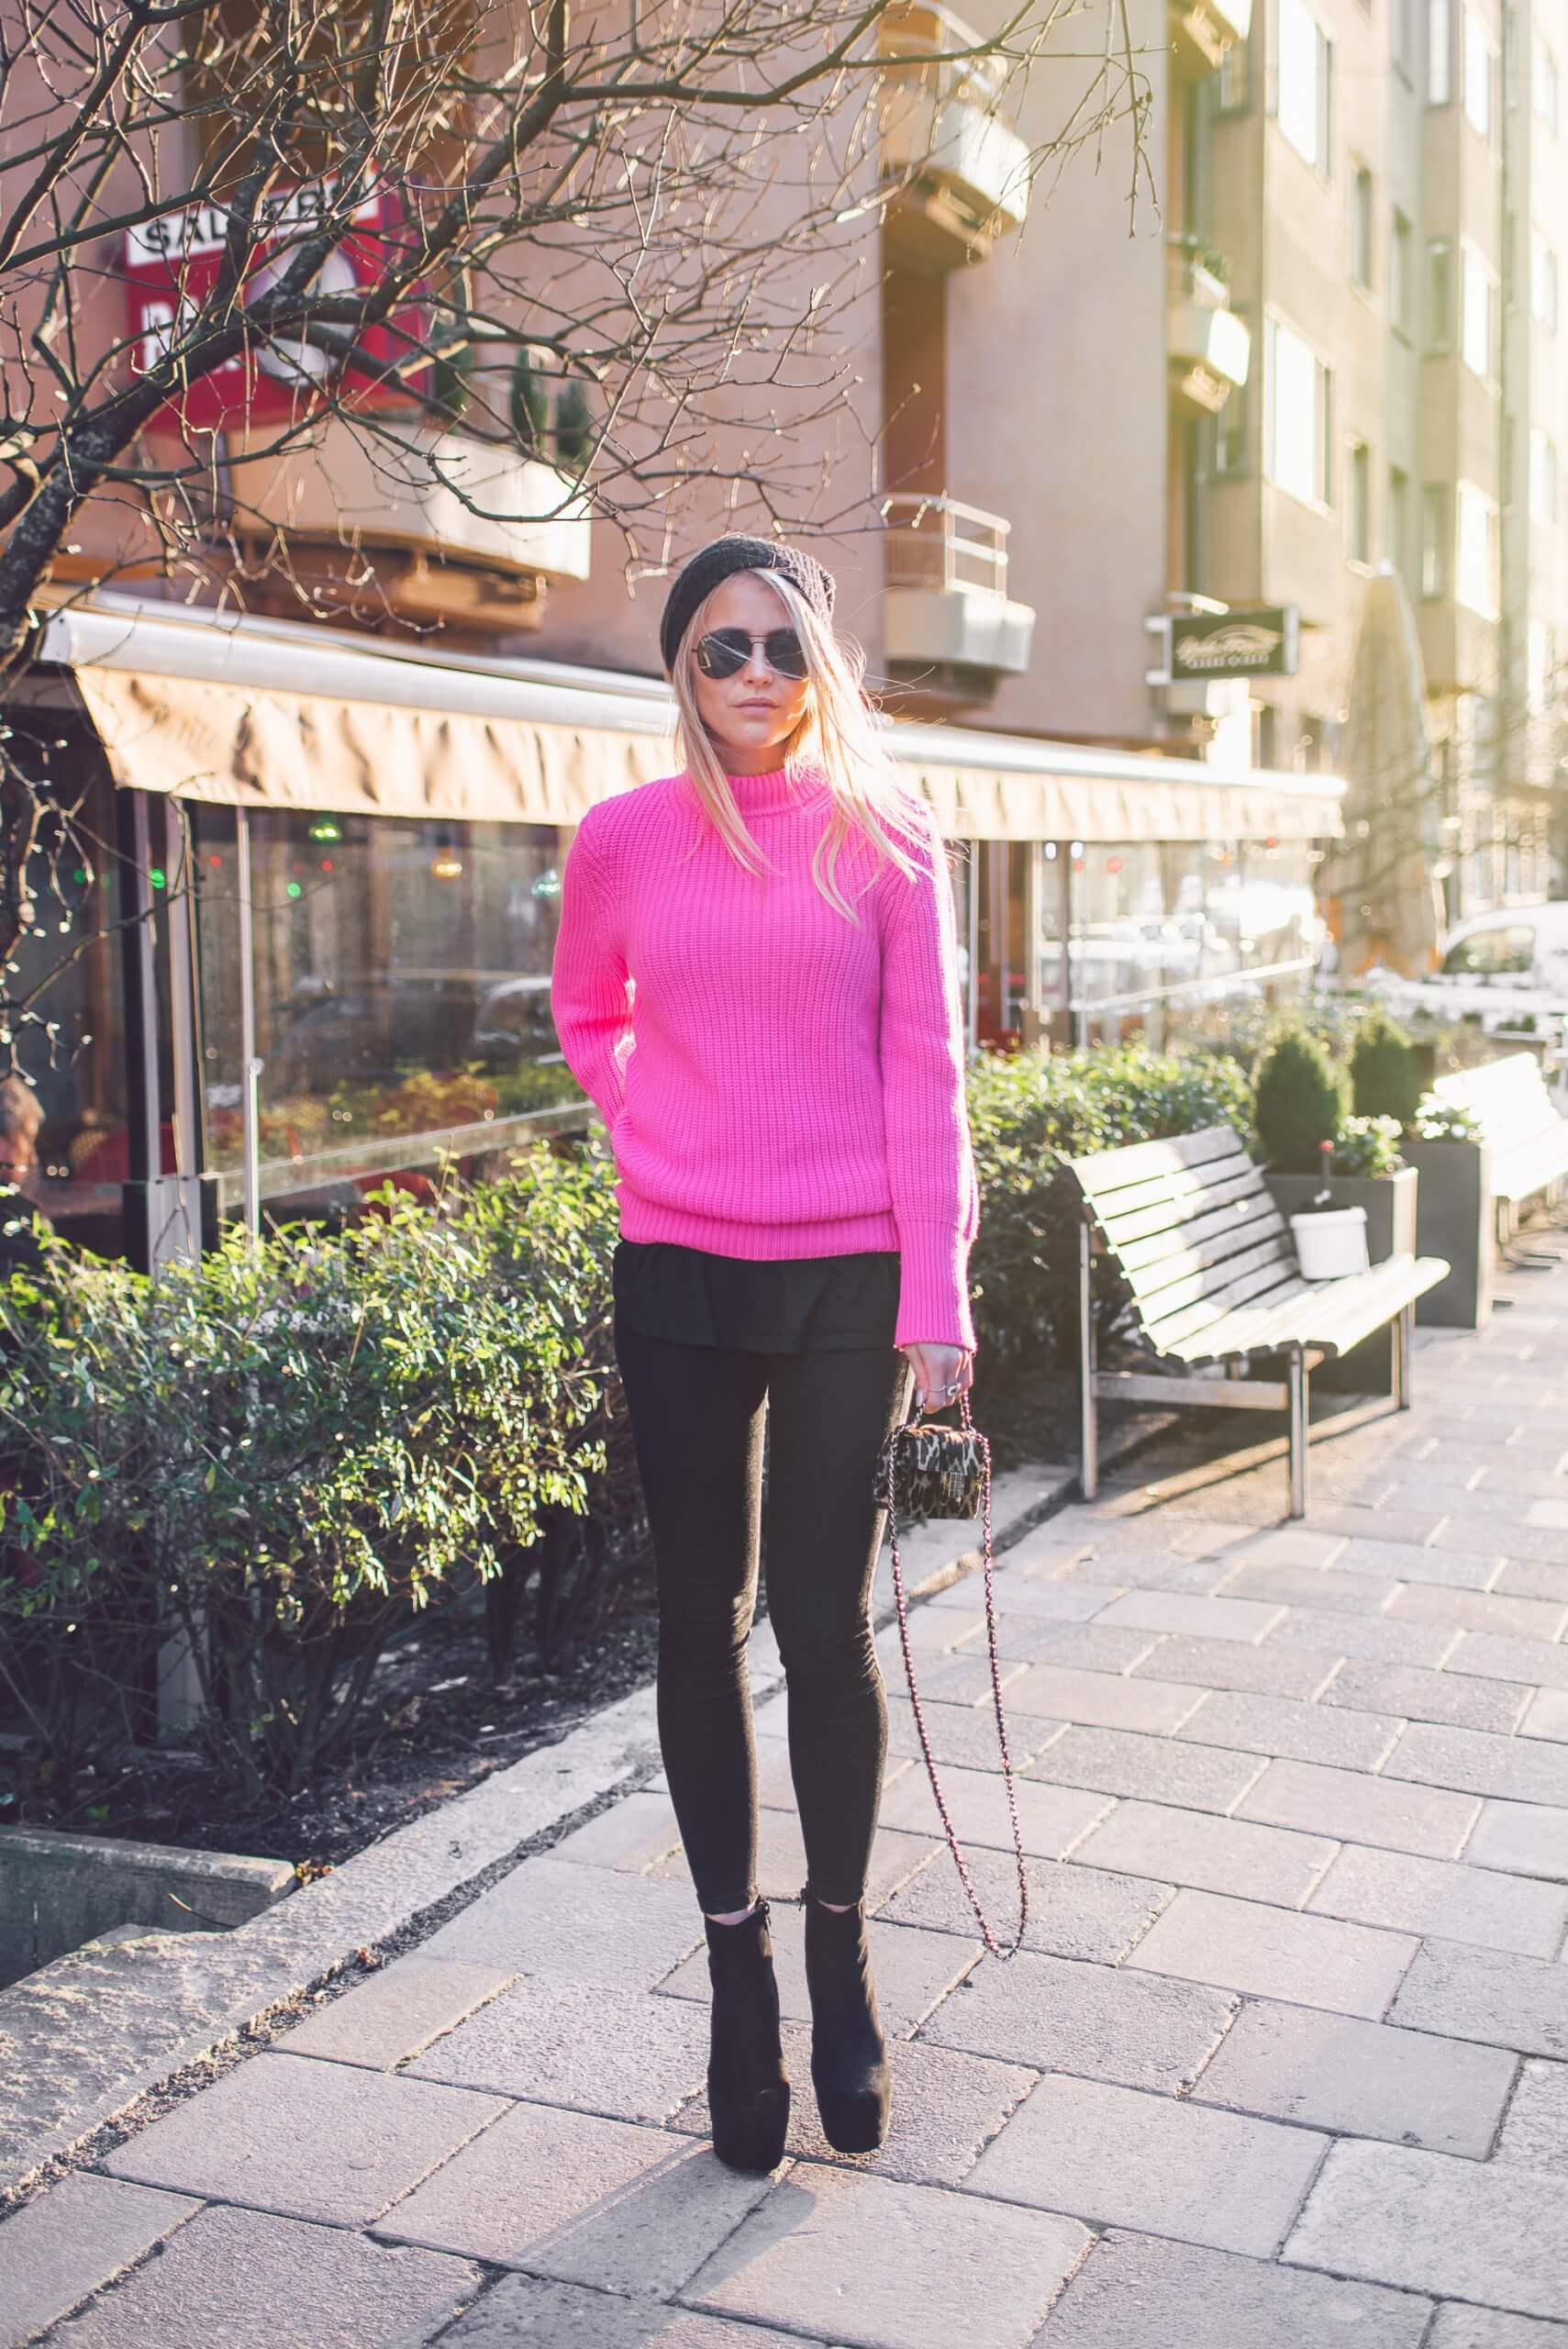 janni-deler-pink-touchDSC_2934-Redigera